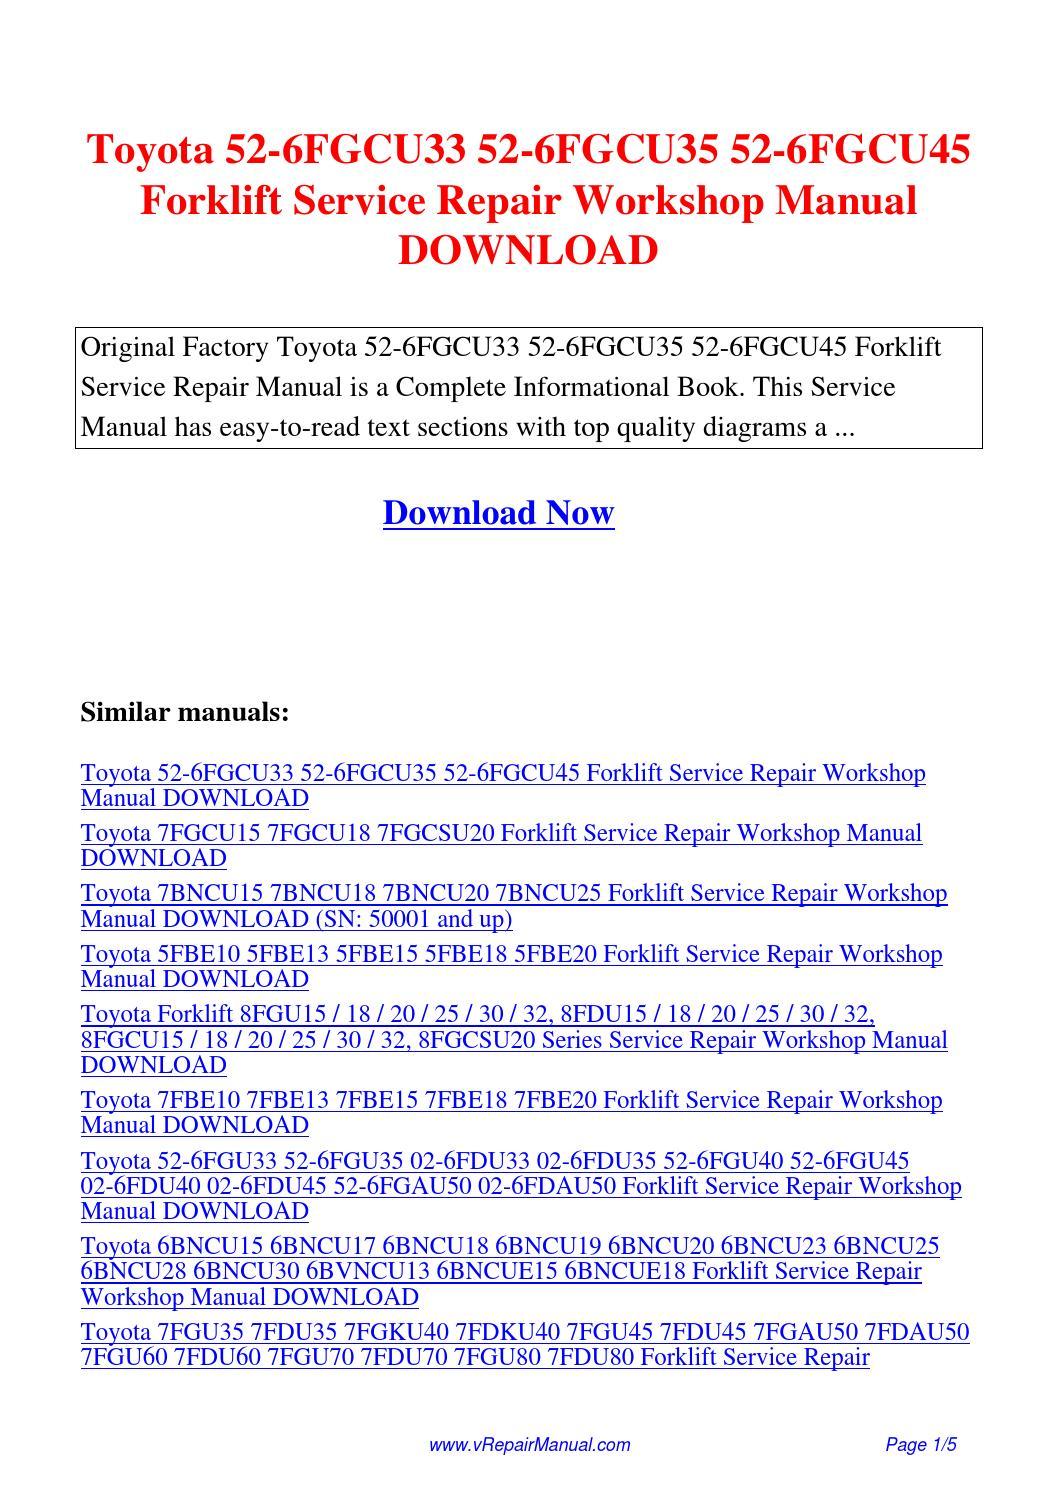 Toyota 52-6FGCU33 52-6FGCU35 52-6FGCU45 Forklift Service Repair Workshop  Manual.pdf by David Zhang - issuu